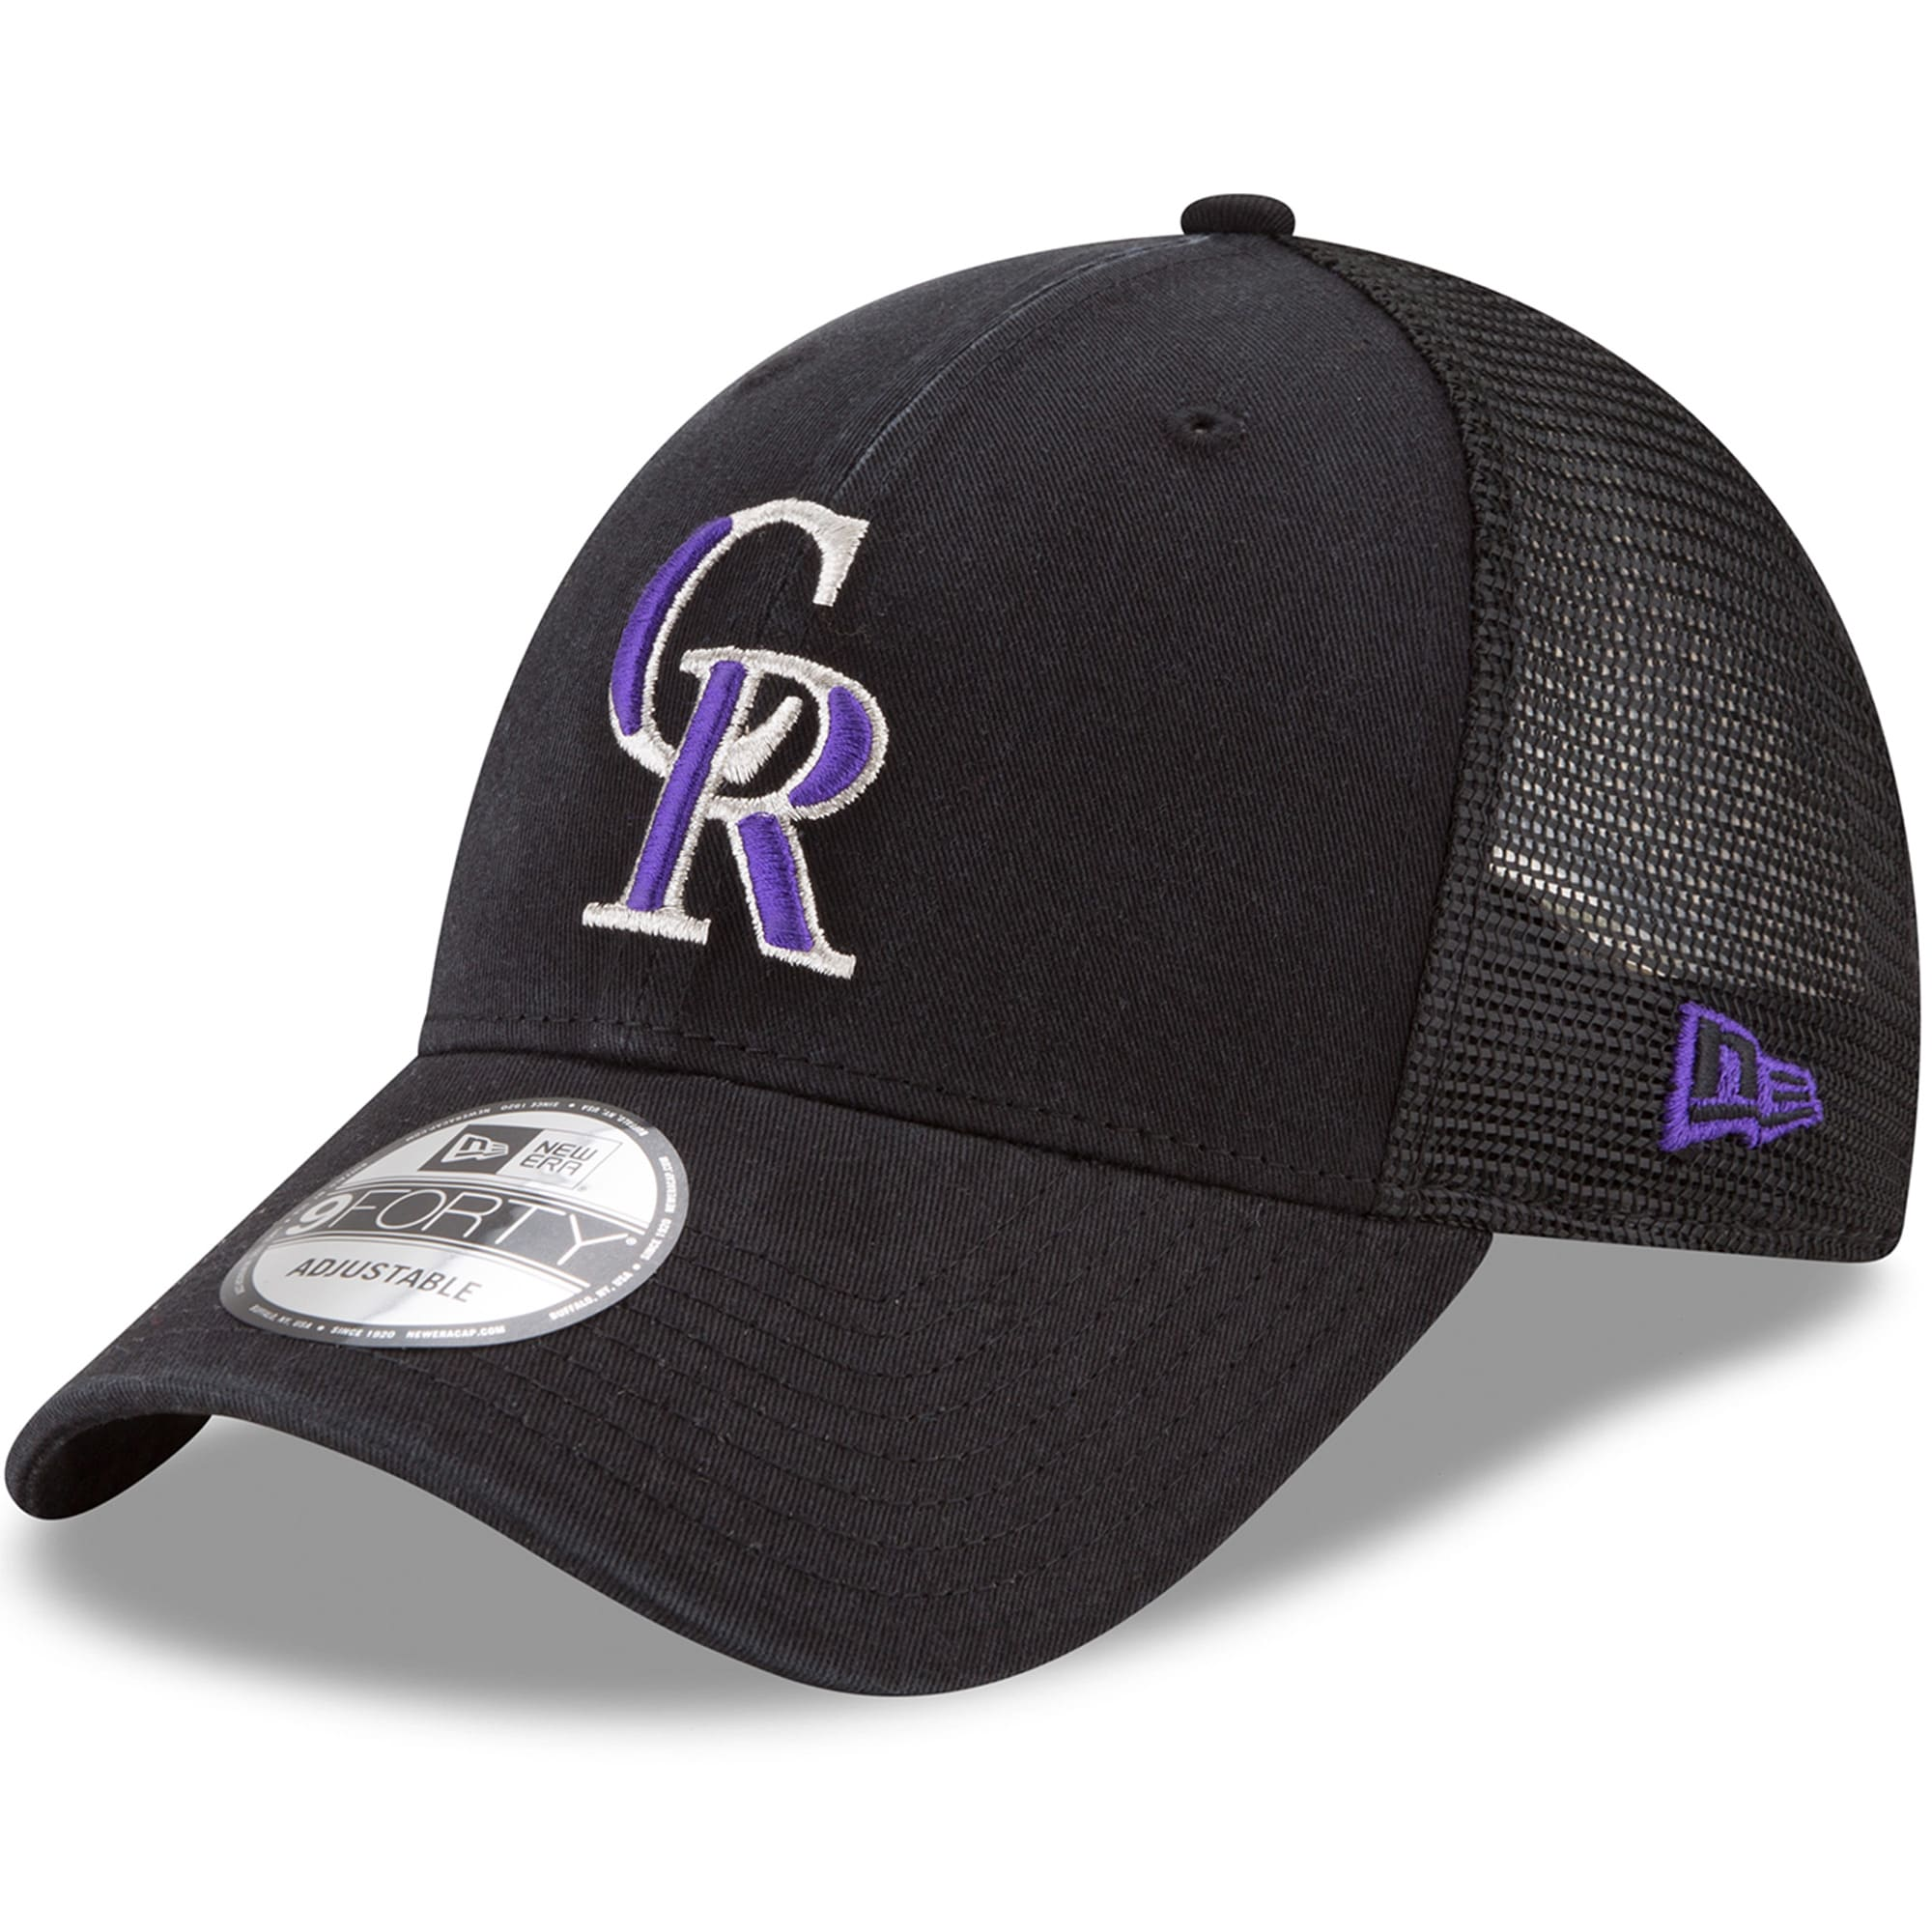 Colorado Rockies New Era Trucker 9FORTY Adjustable Snapback Hat - Black